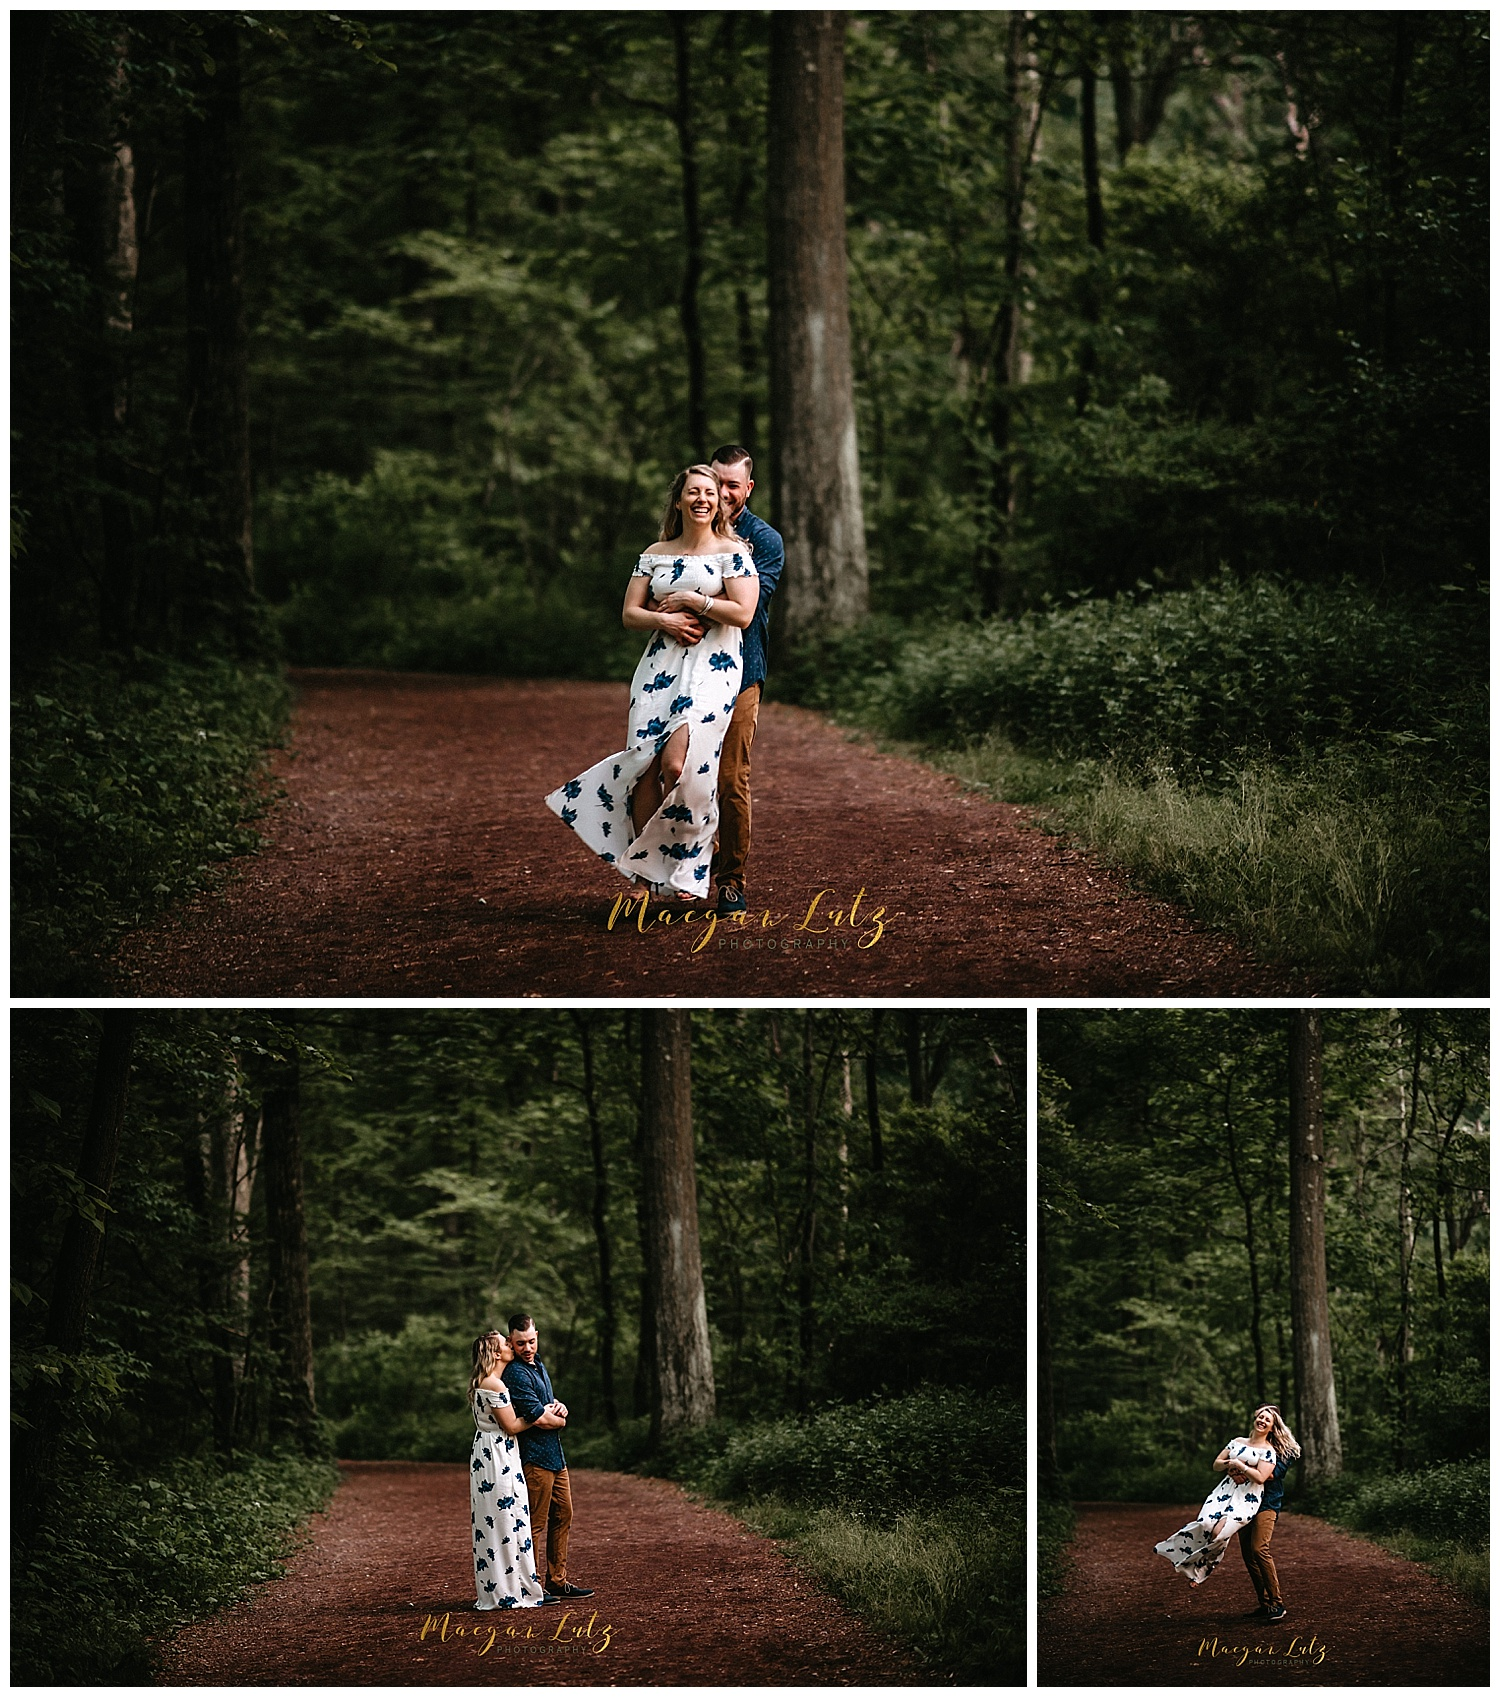 NEPA-wedding-engagement-photographer-Jacobsburg-state-park-Easton-PA_0055.jpg